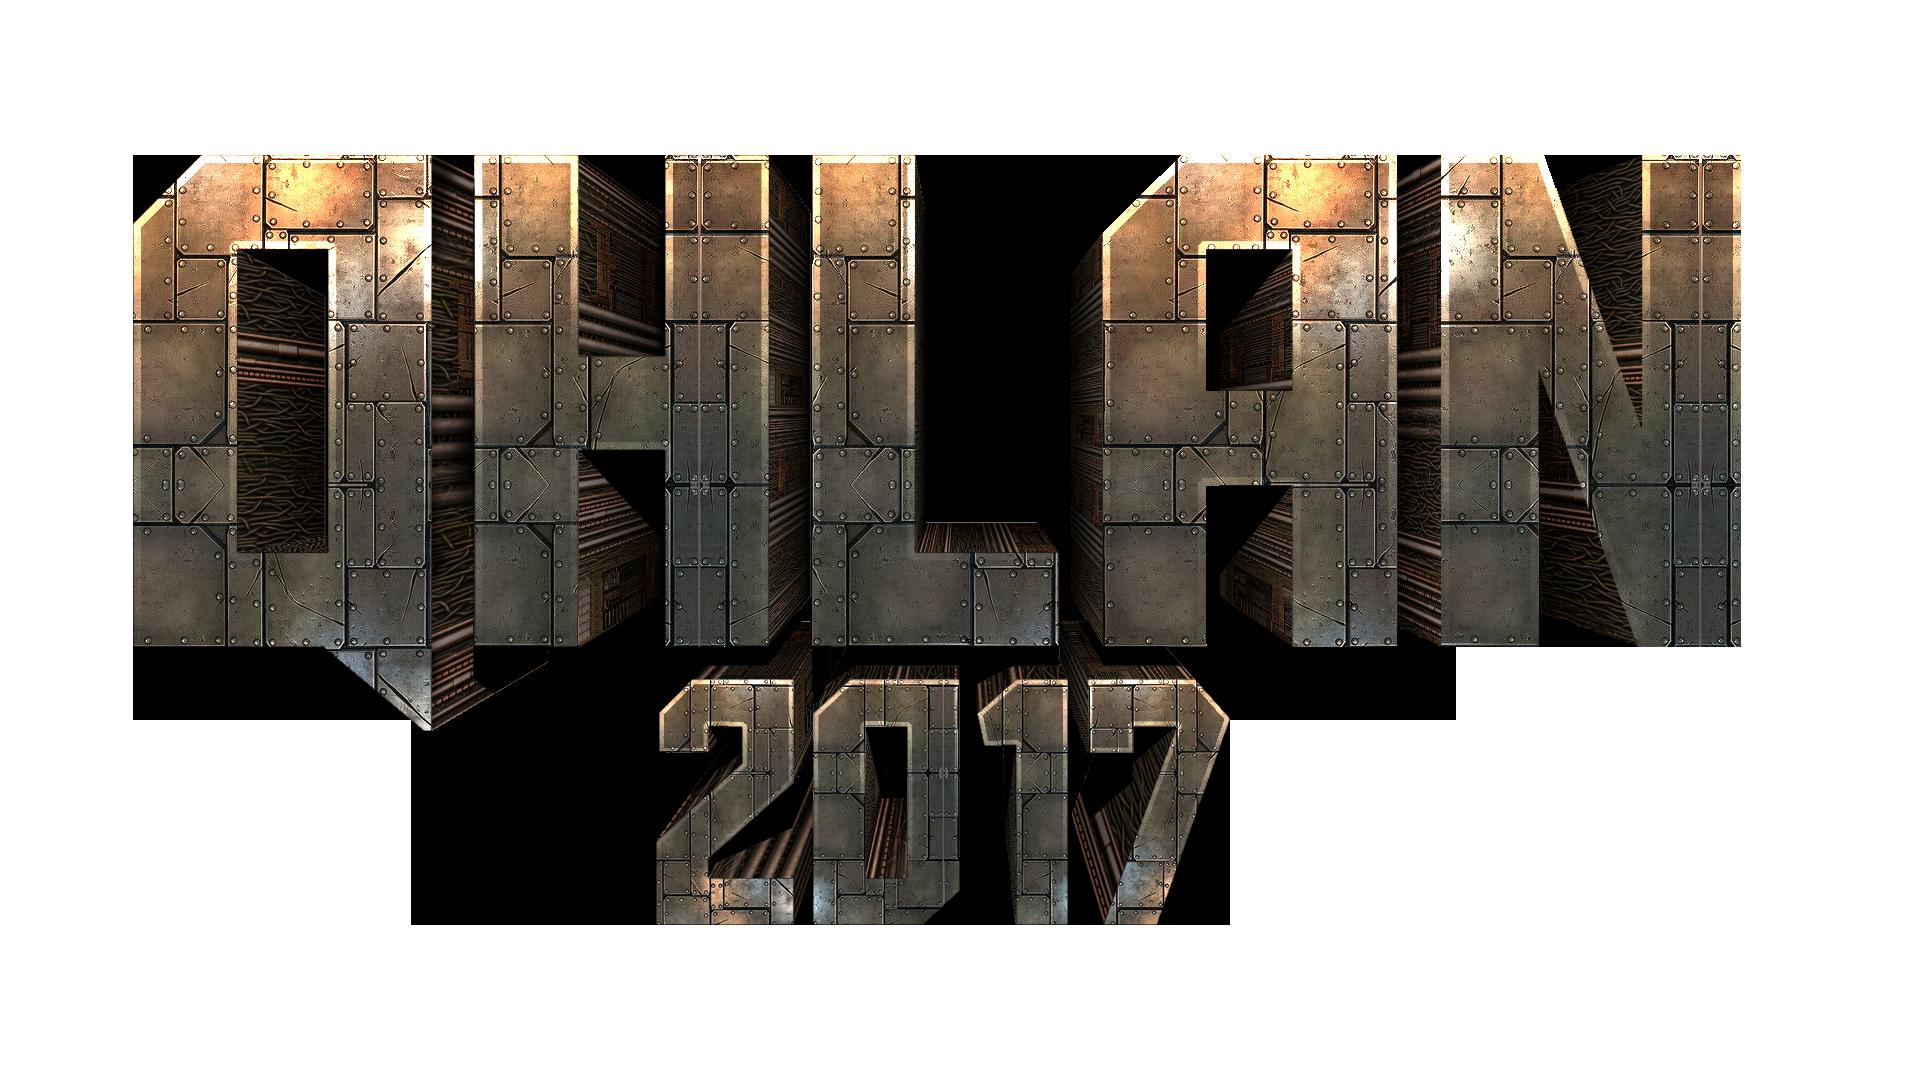 http://blaps.se/qw/qh17/logo-full-alpha.png